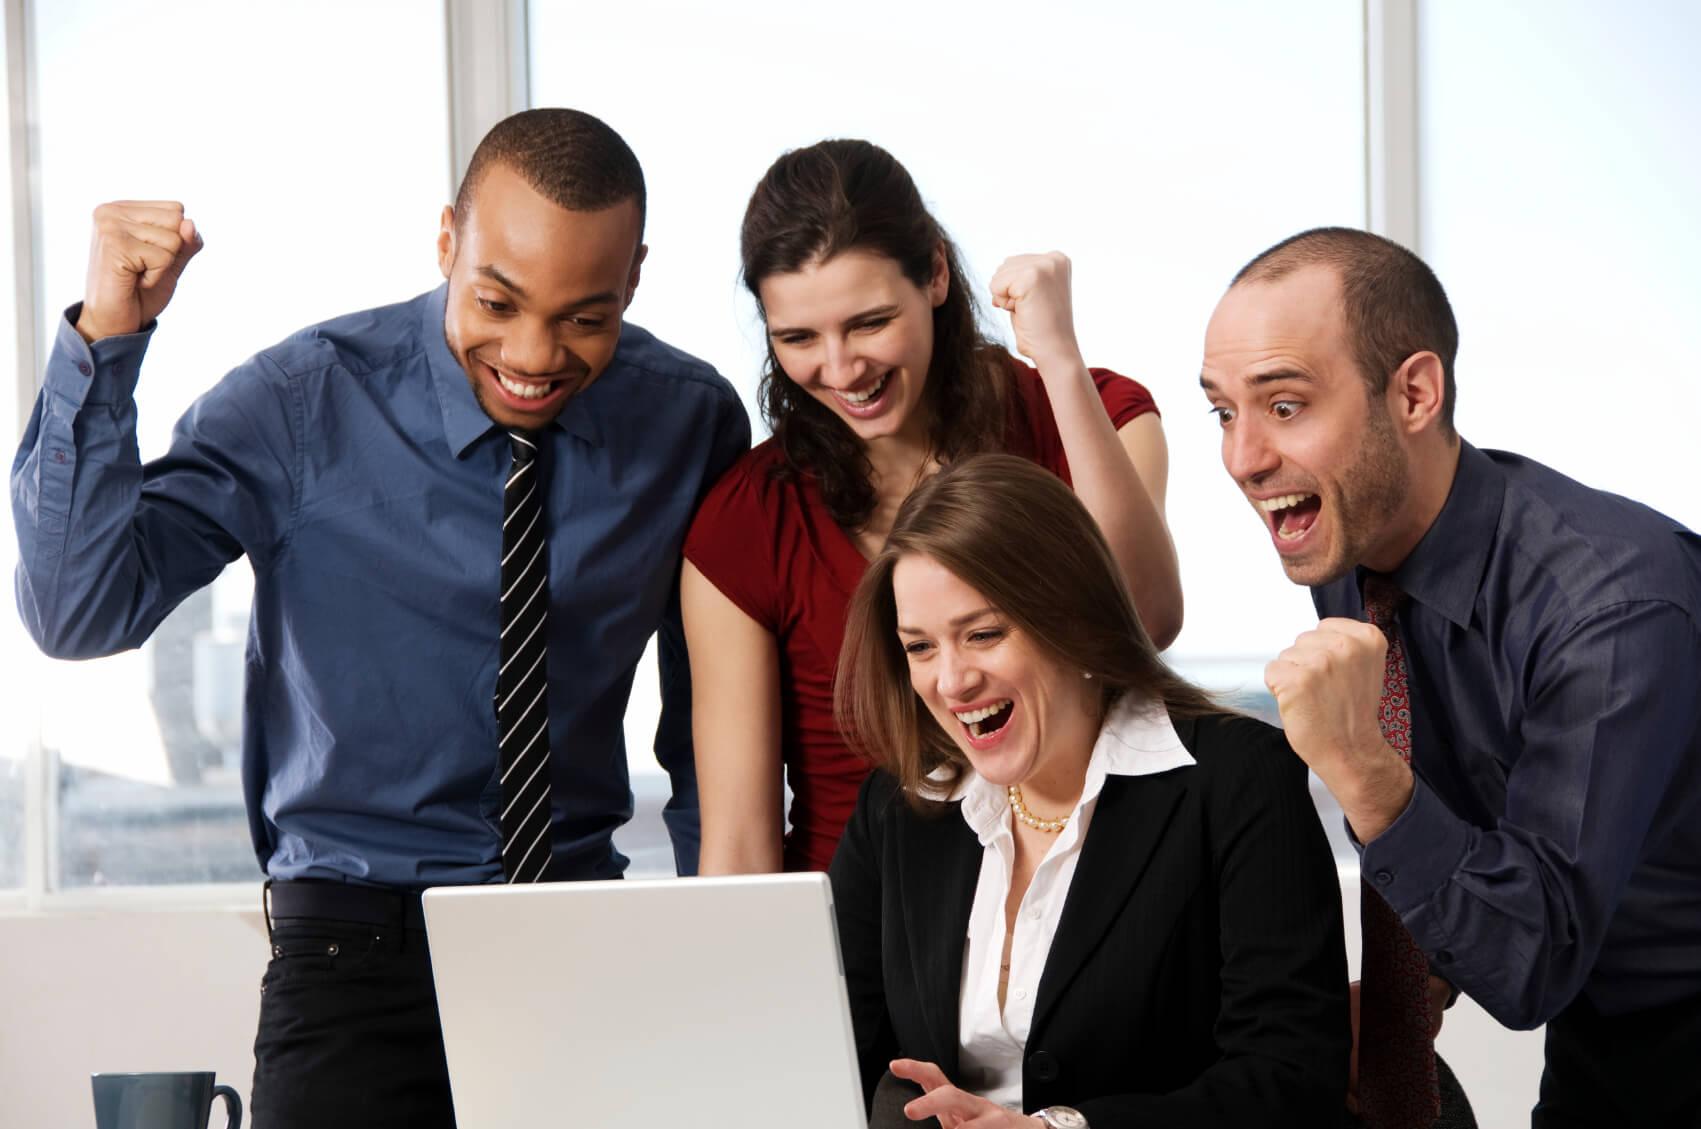 Four business associates celebrating together